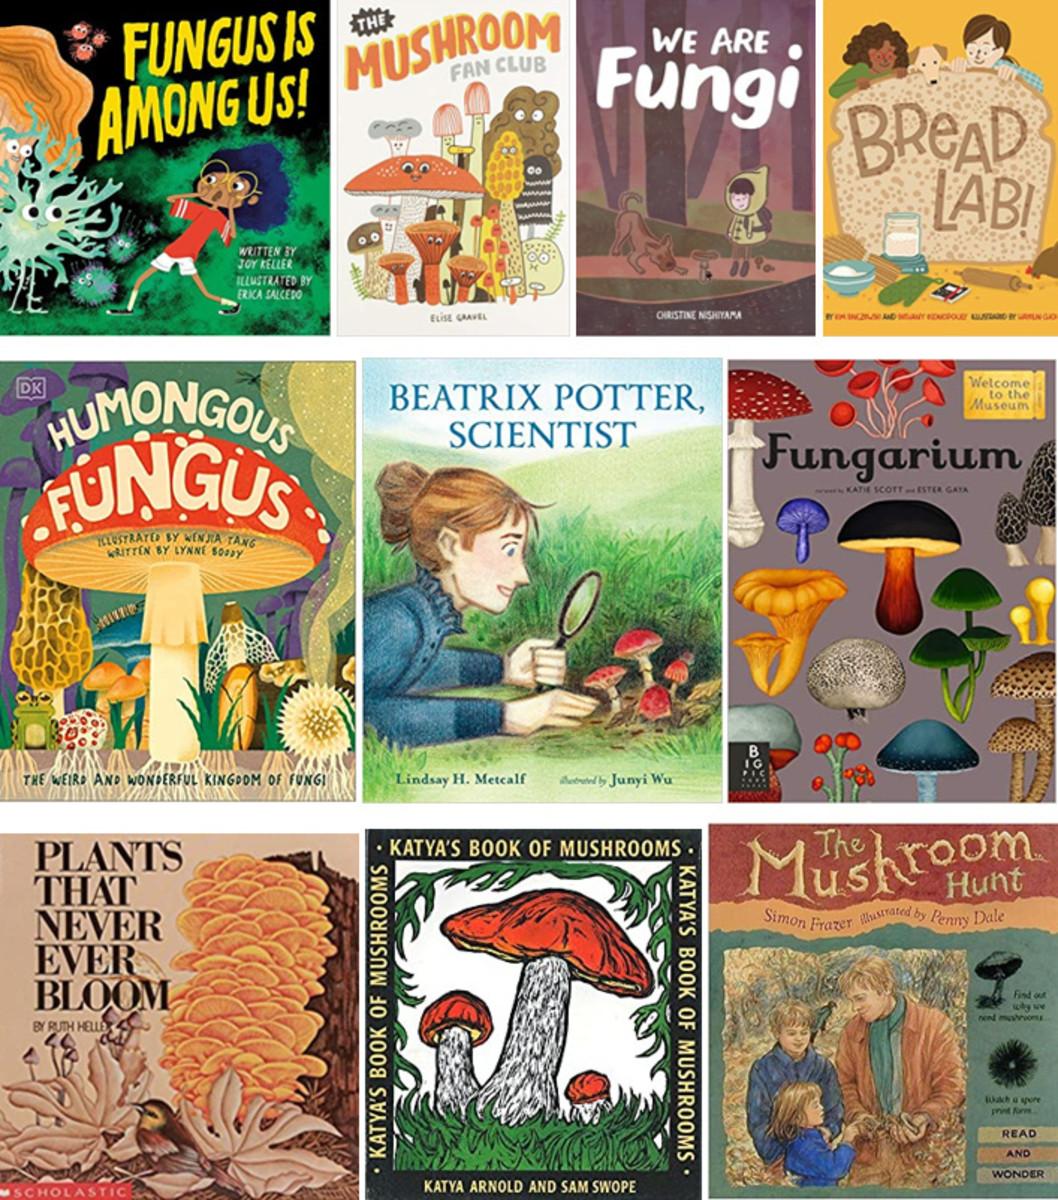 Best Children's Books on Fungi